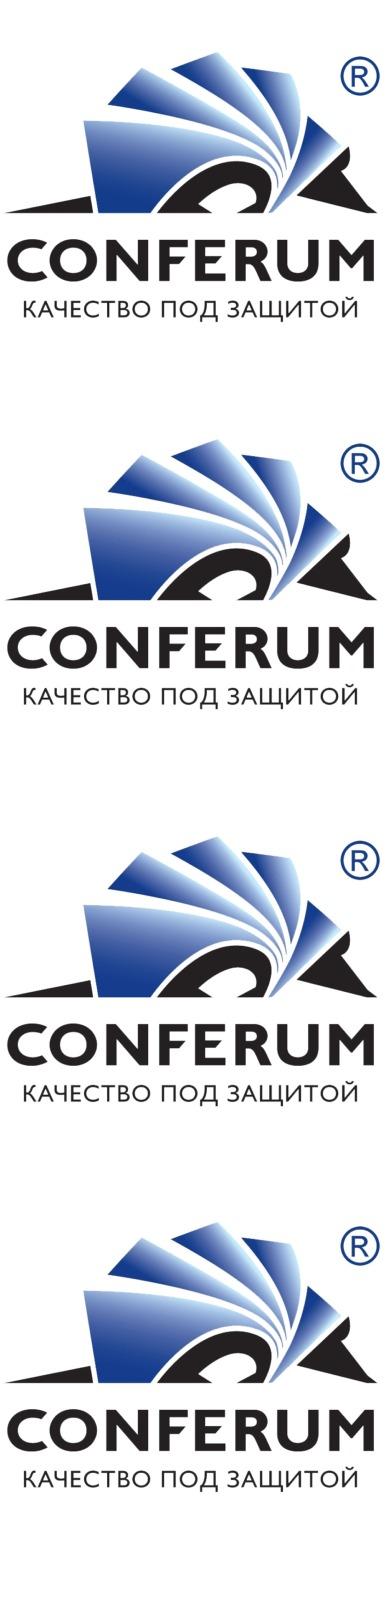 Univer-Konferum-1